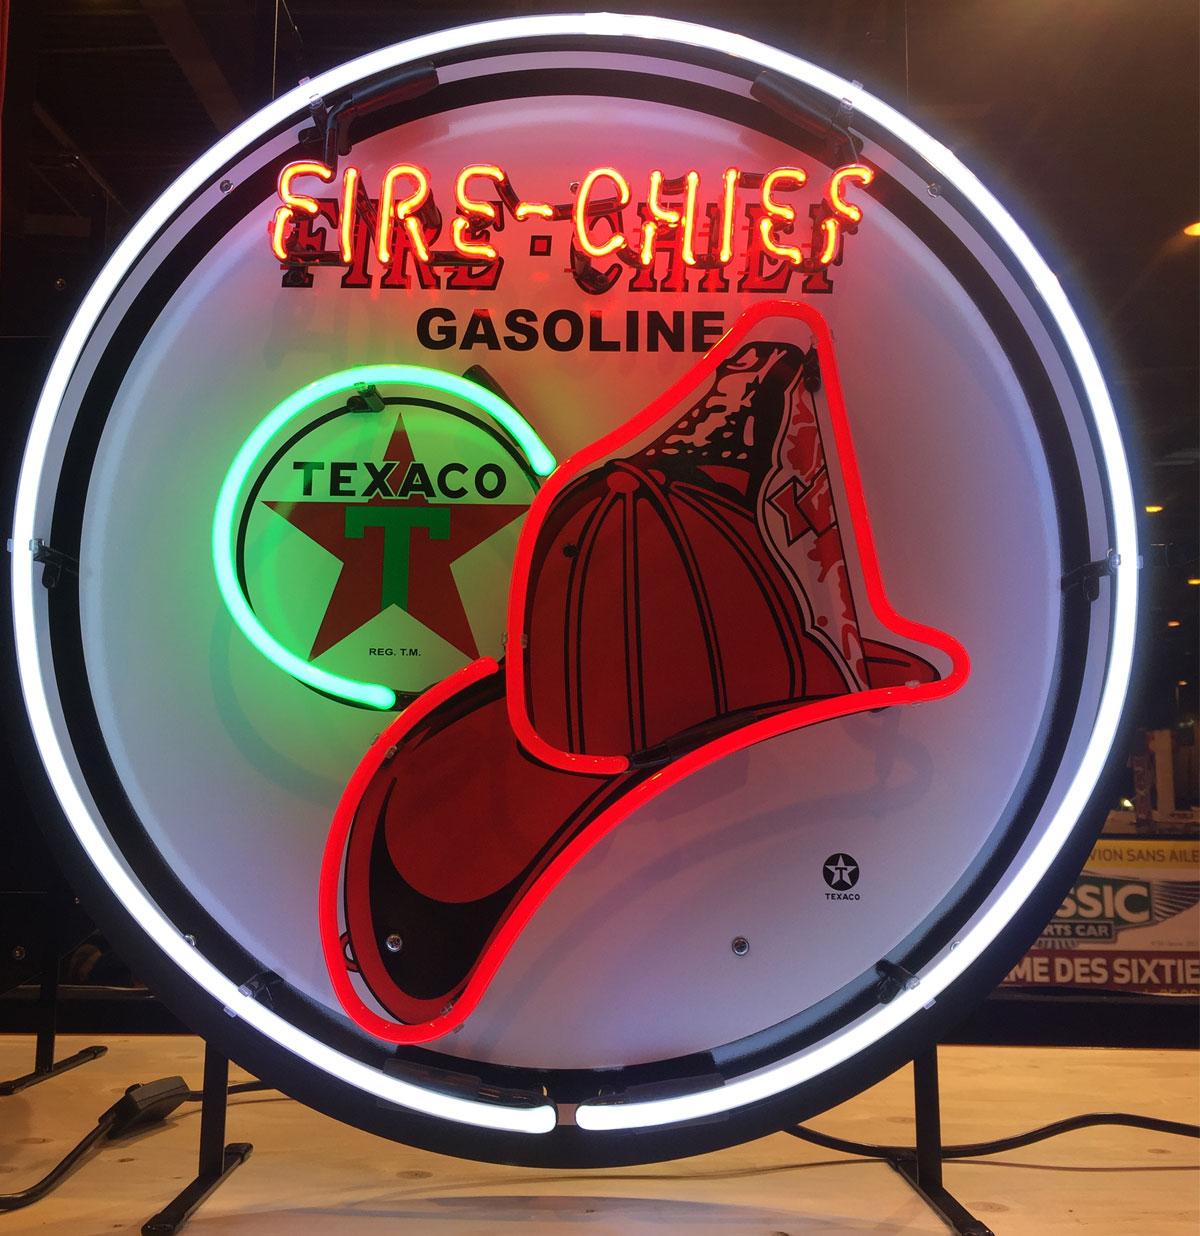 Texaco Fire-Chief Gasoline Neon Verlichting Met Bord 64 x 64 cm